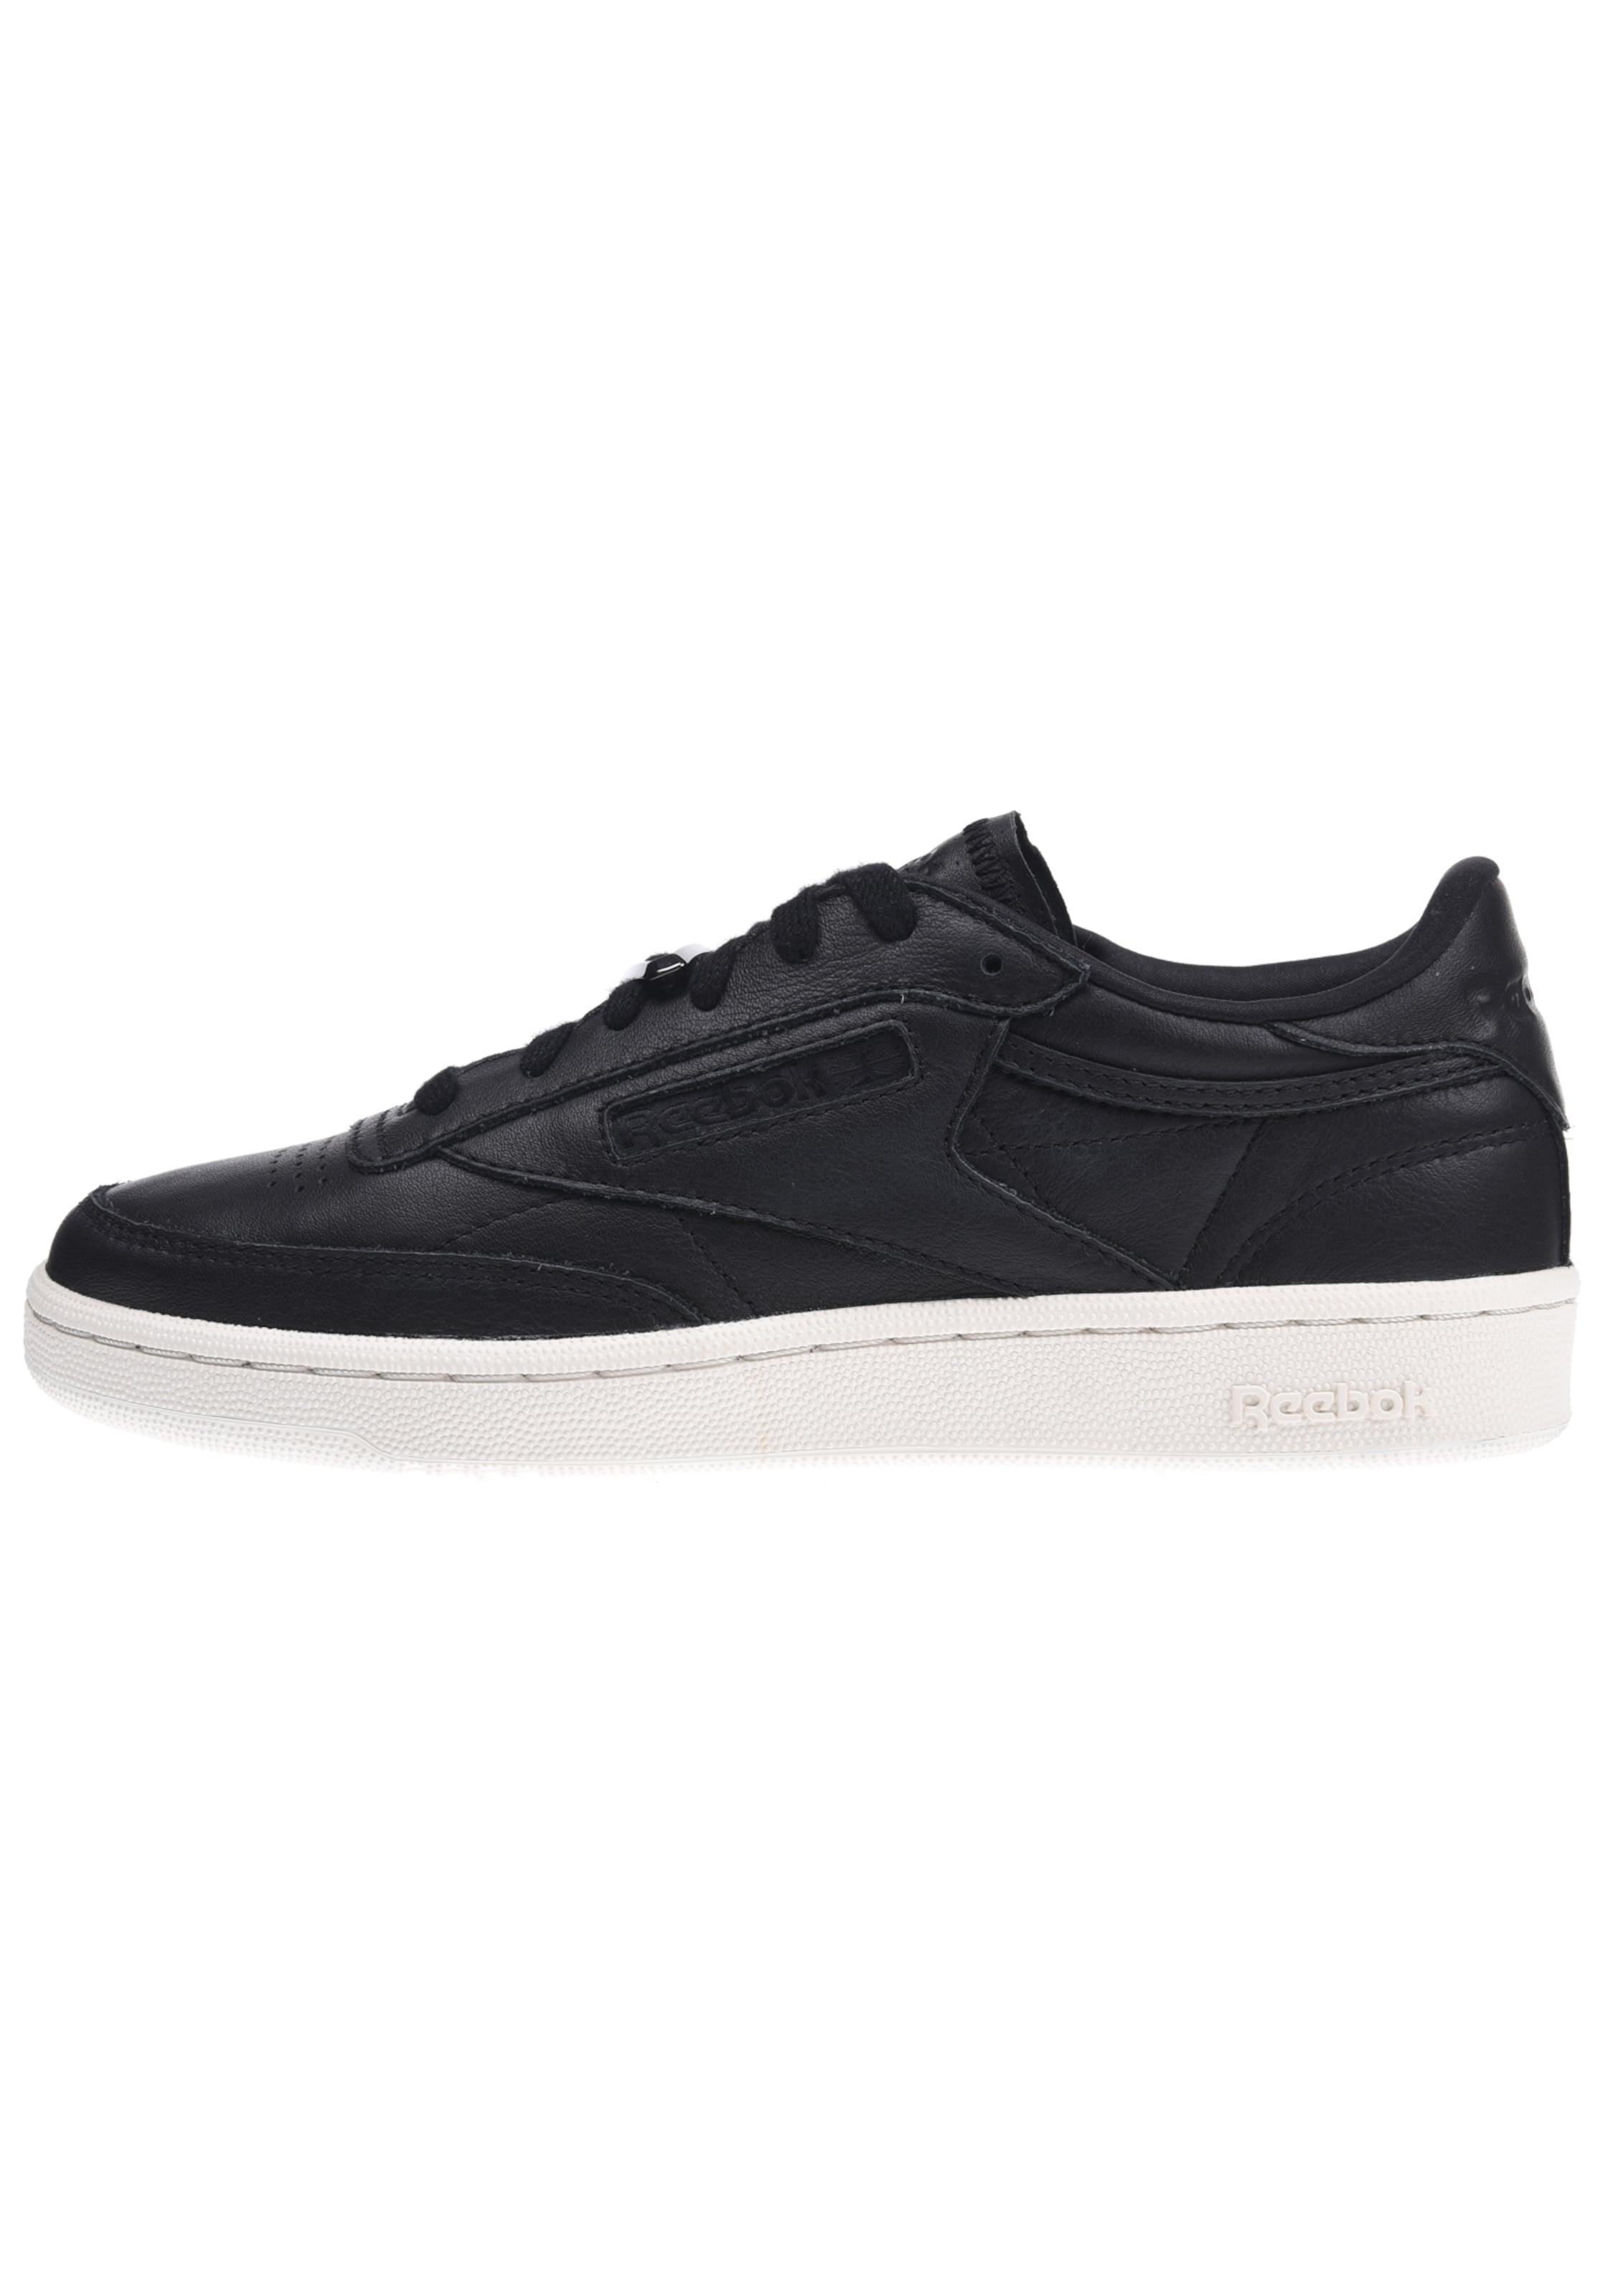 REEBOK Sneaker  Club C 85 Hardware